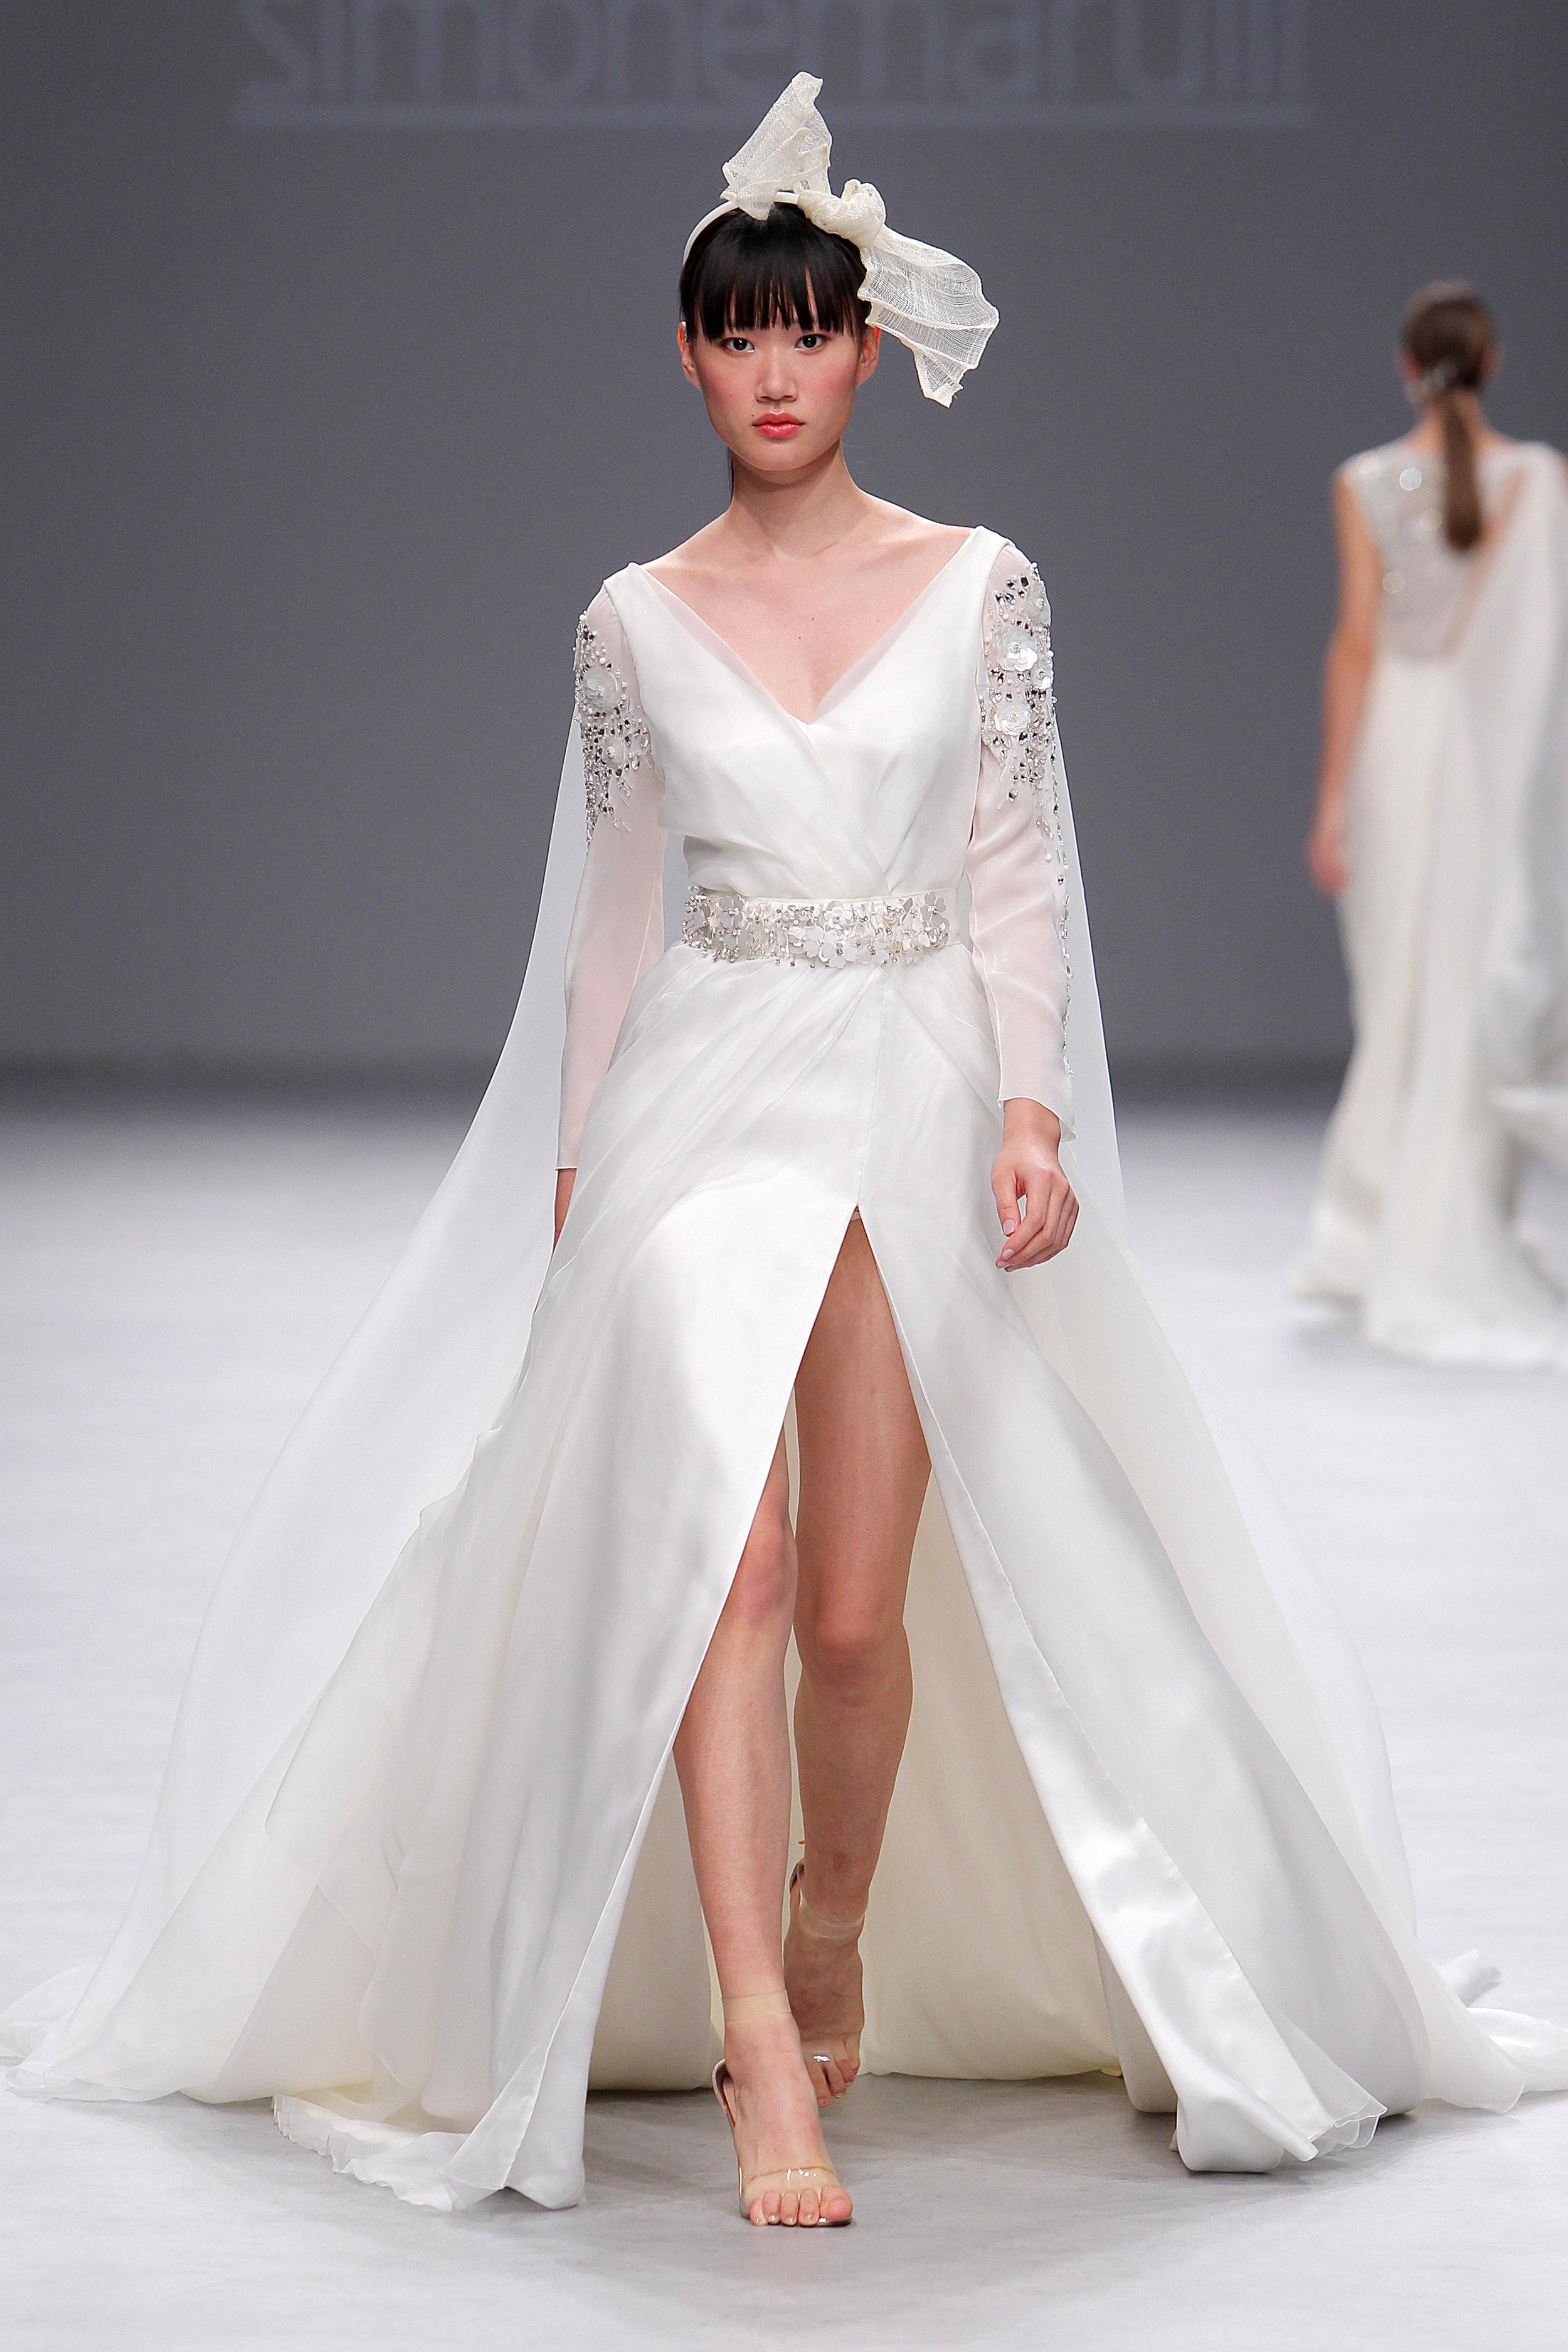 Diseñador: Simone Marulli - Pasarela:  Valmont Barcelona Bridal Fashion Week